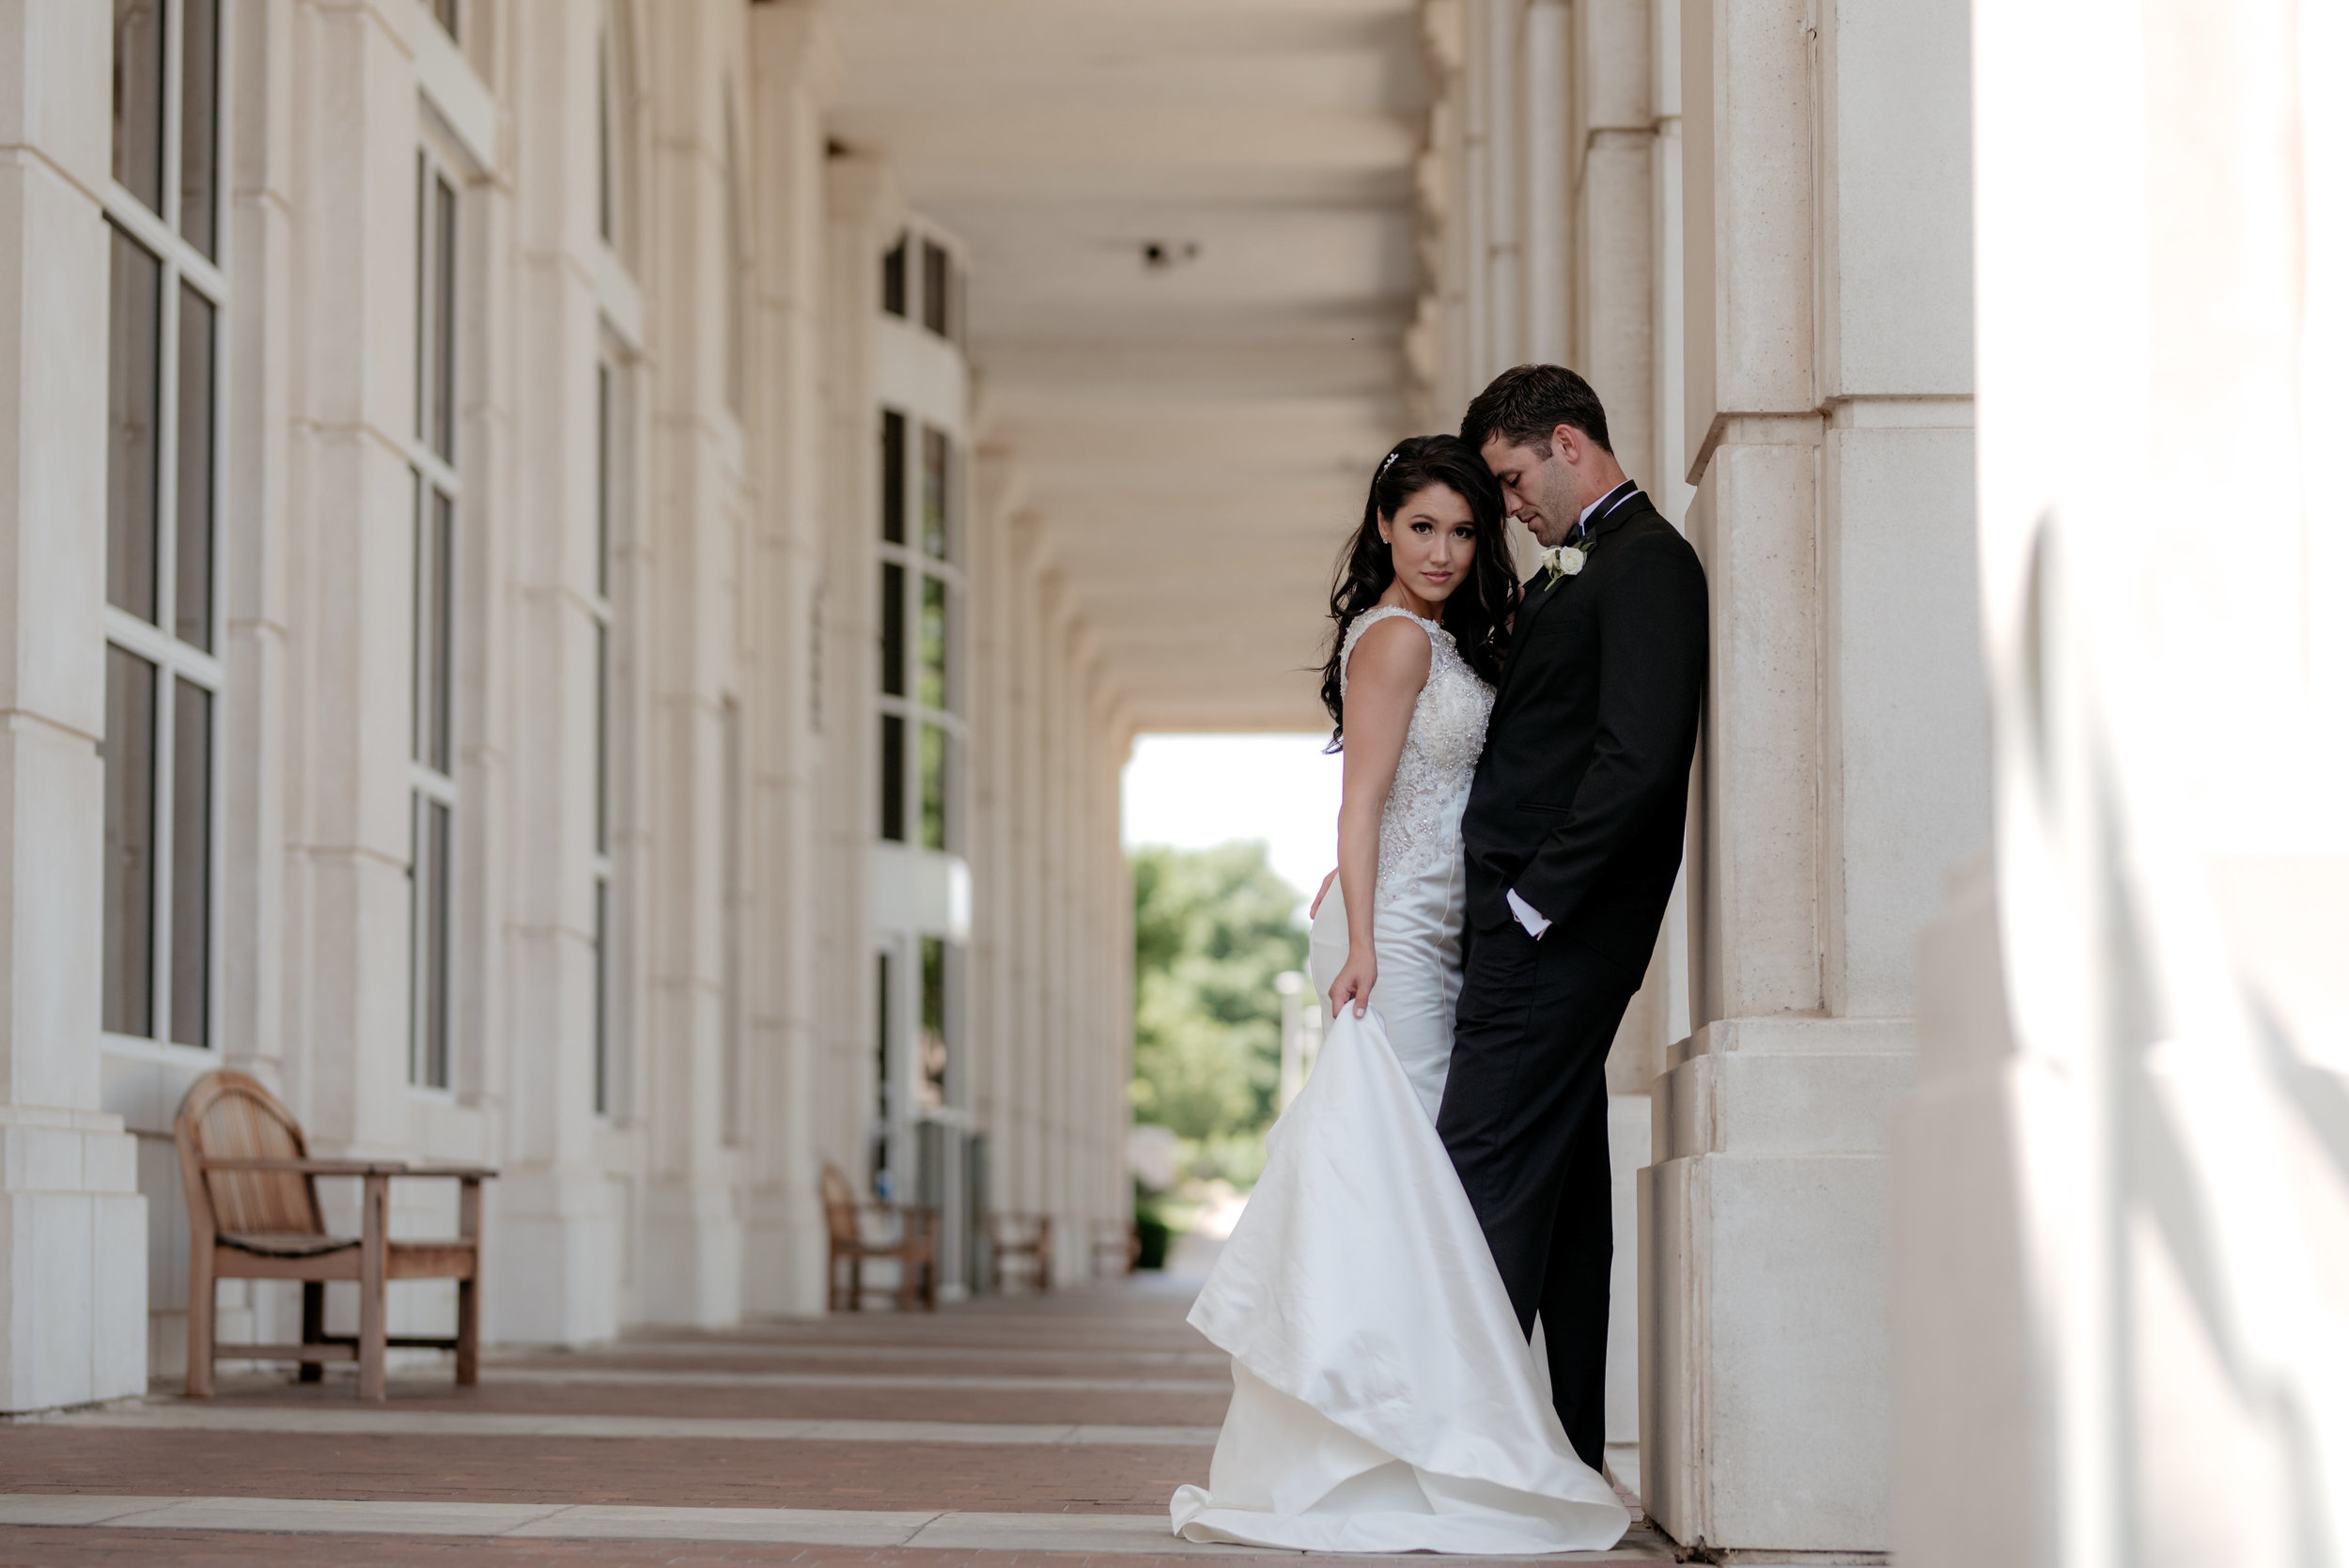 Ashley.Price.Wedding.2018.©TheStirewalts-152.jpg